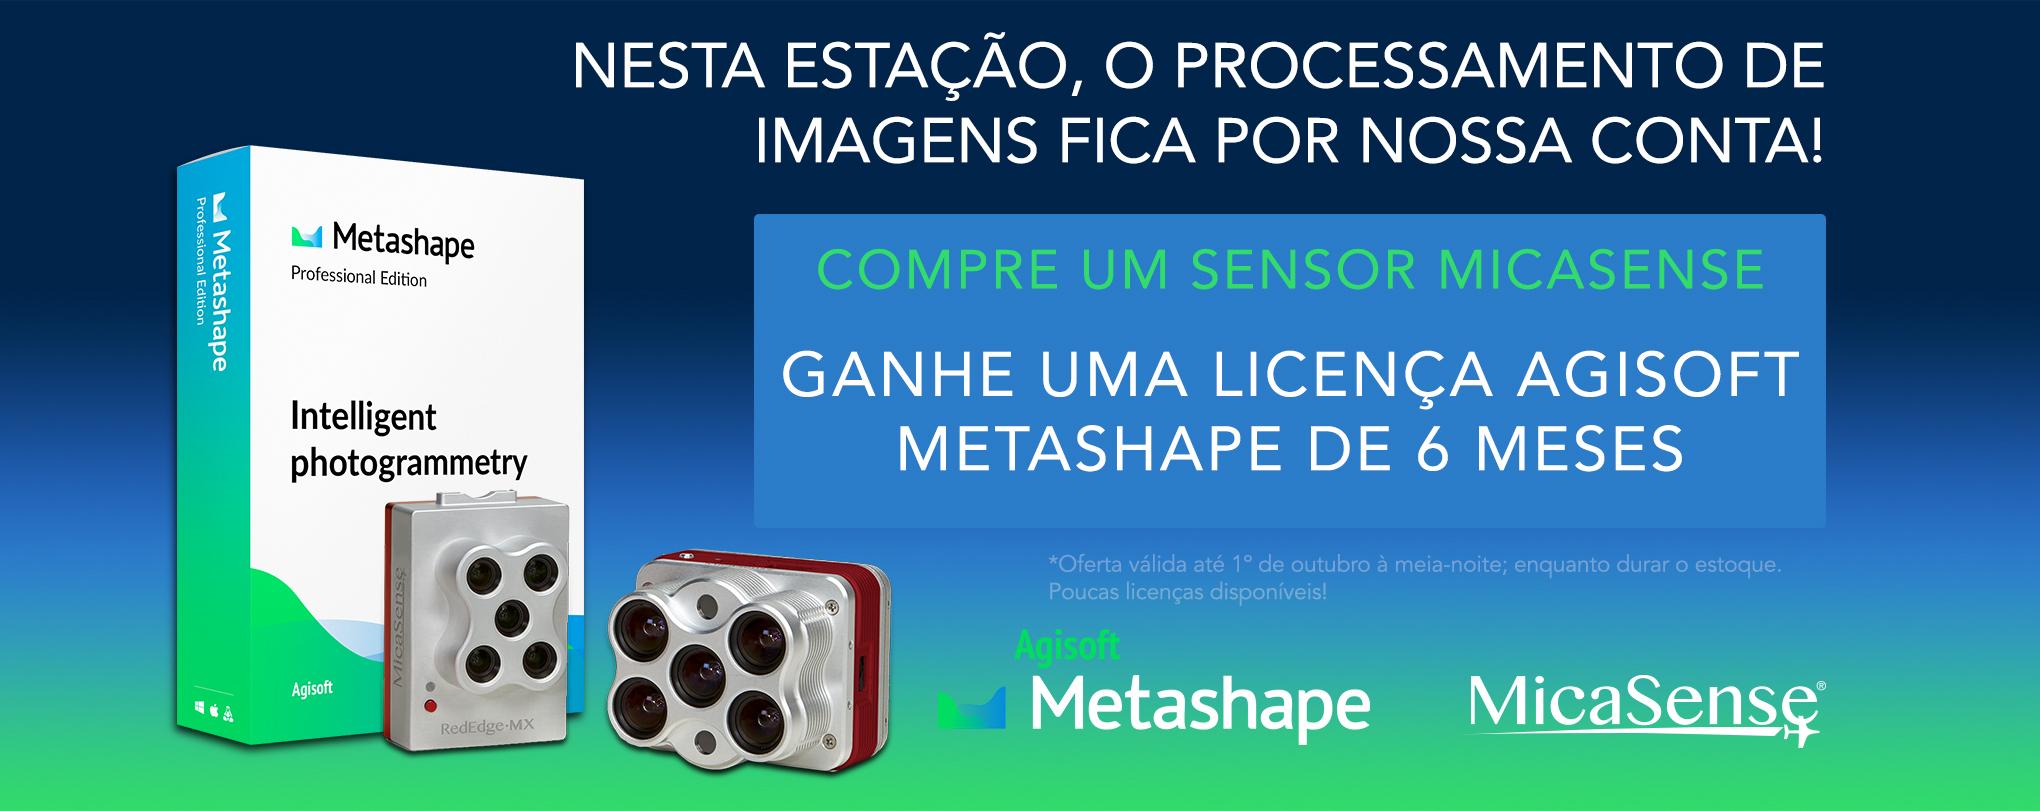 Web Banner Portuguese.jpg